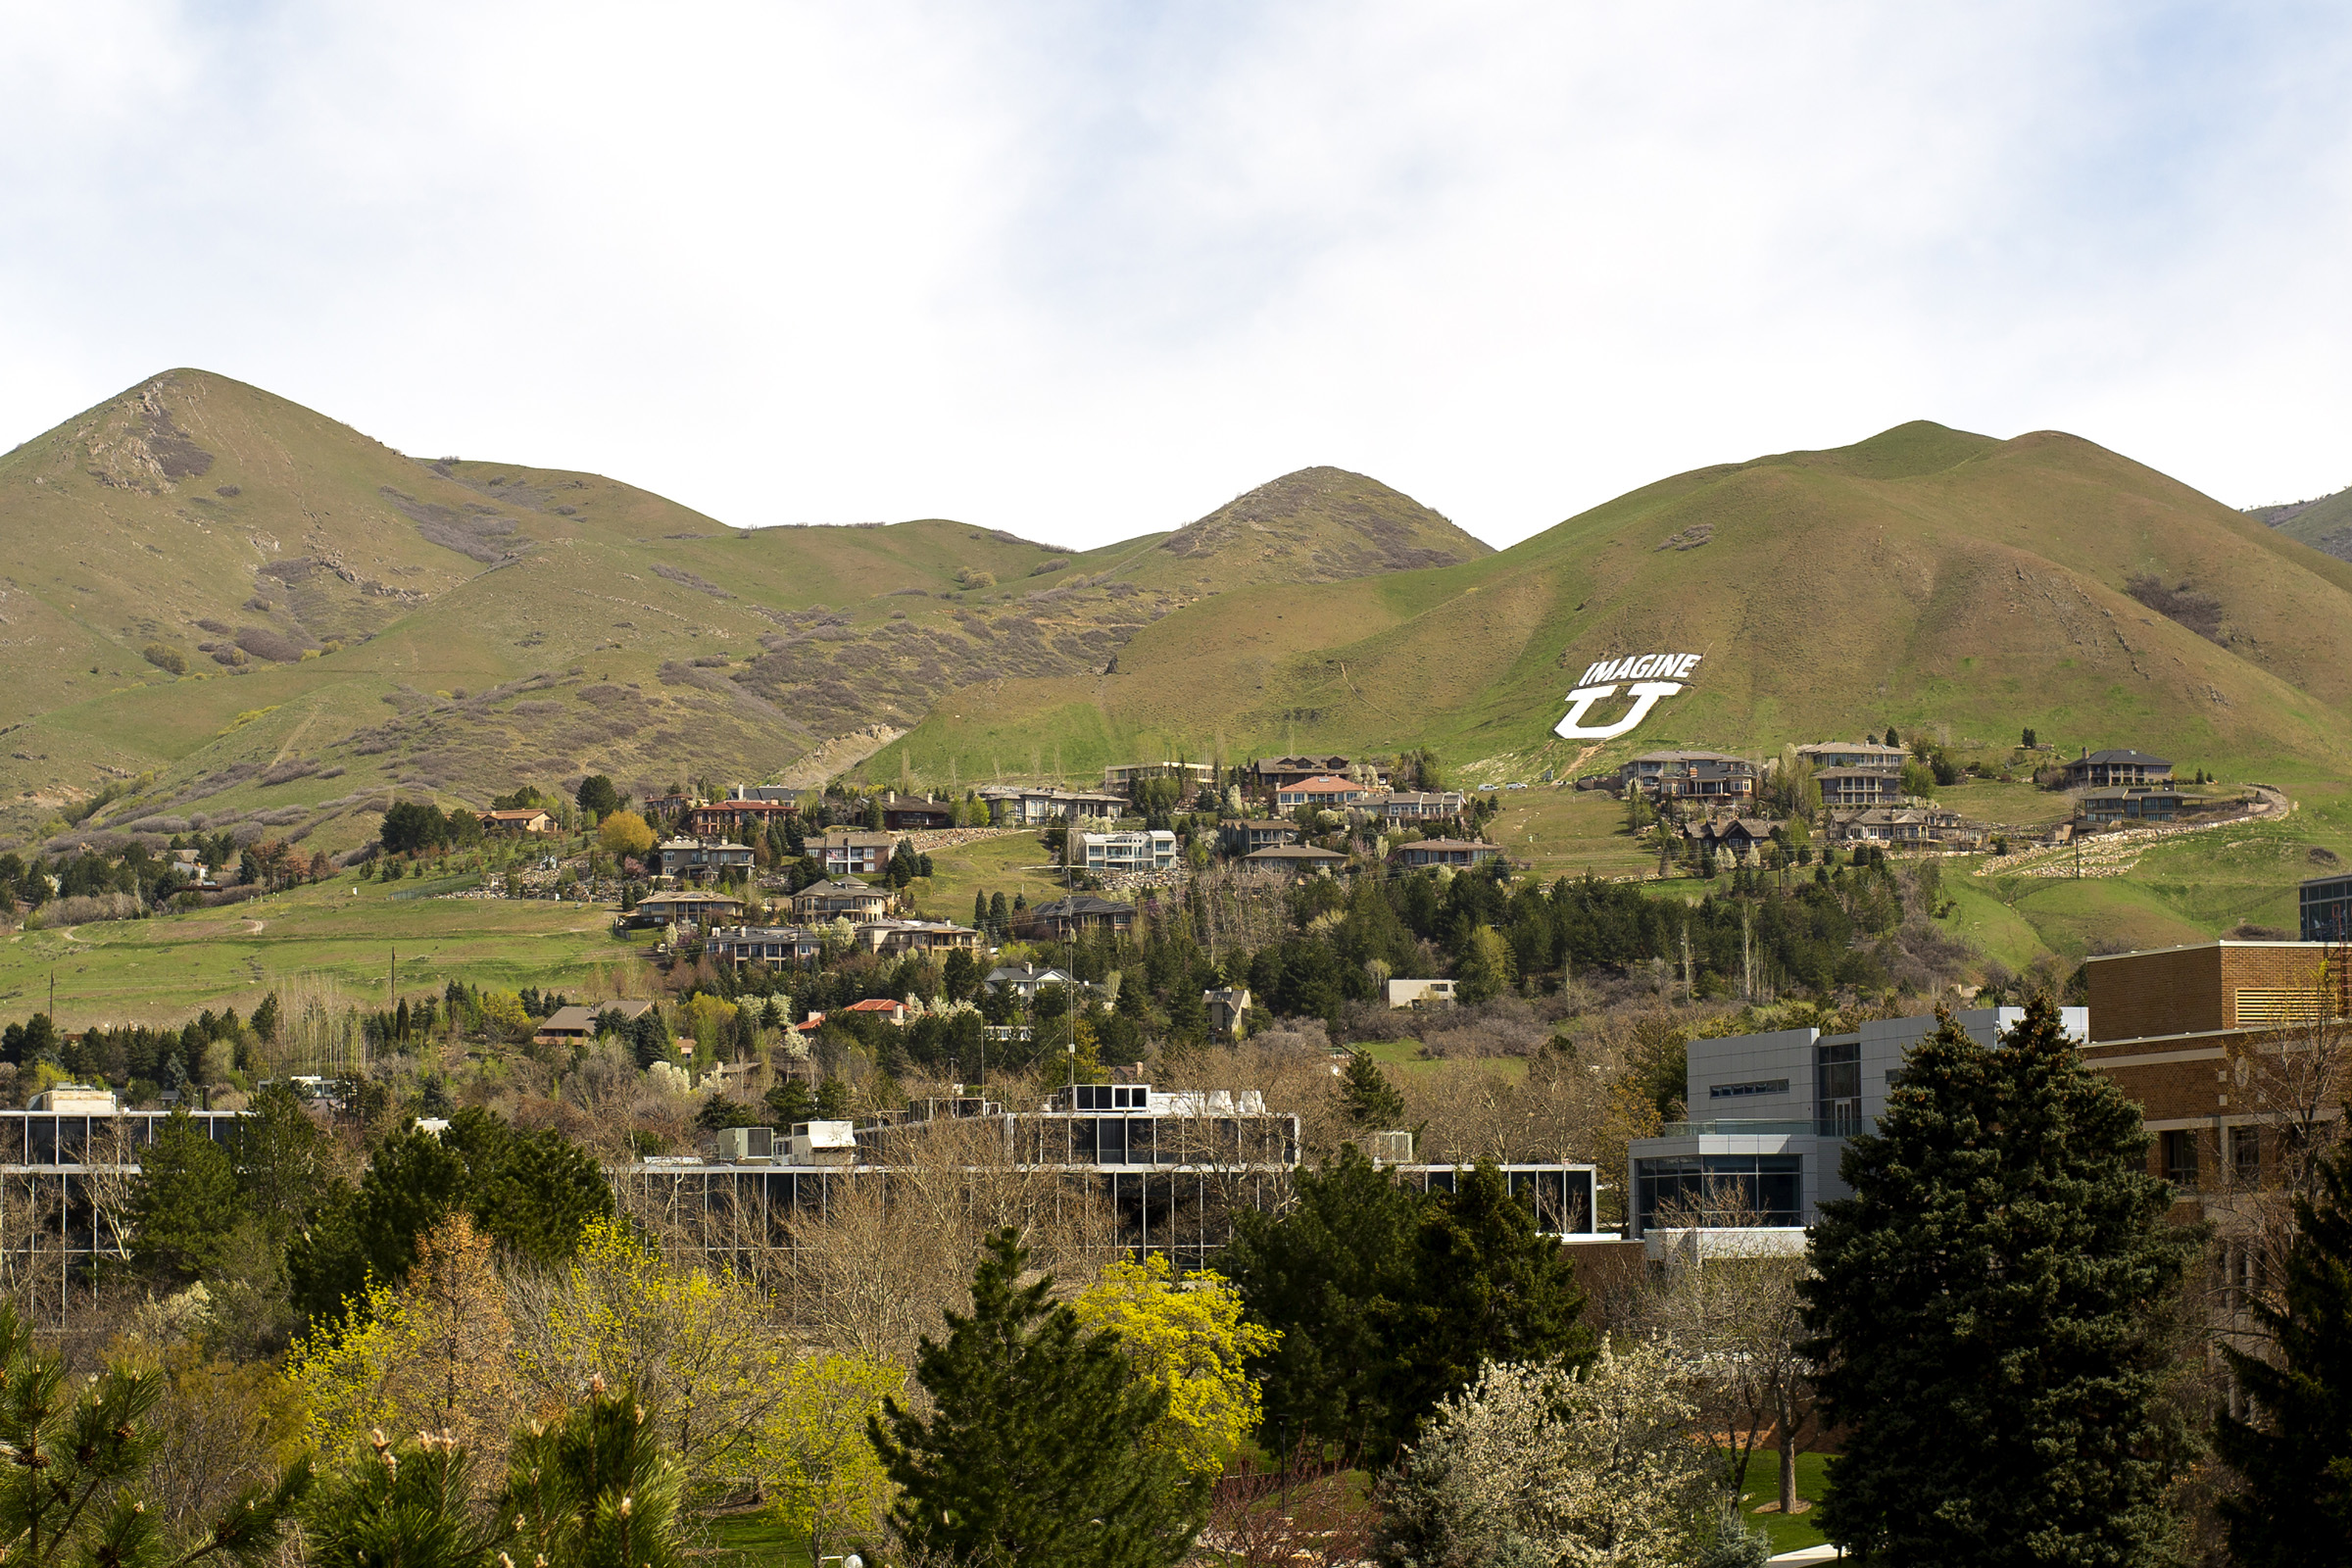 """Imagine U"" on the hillside."